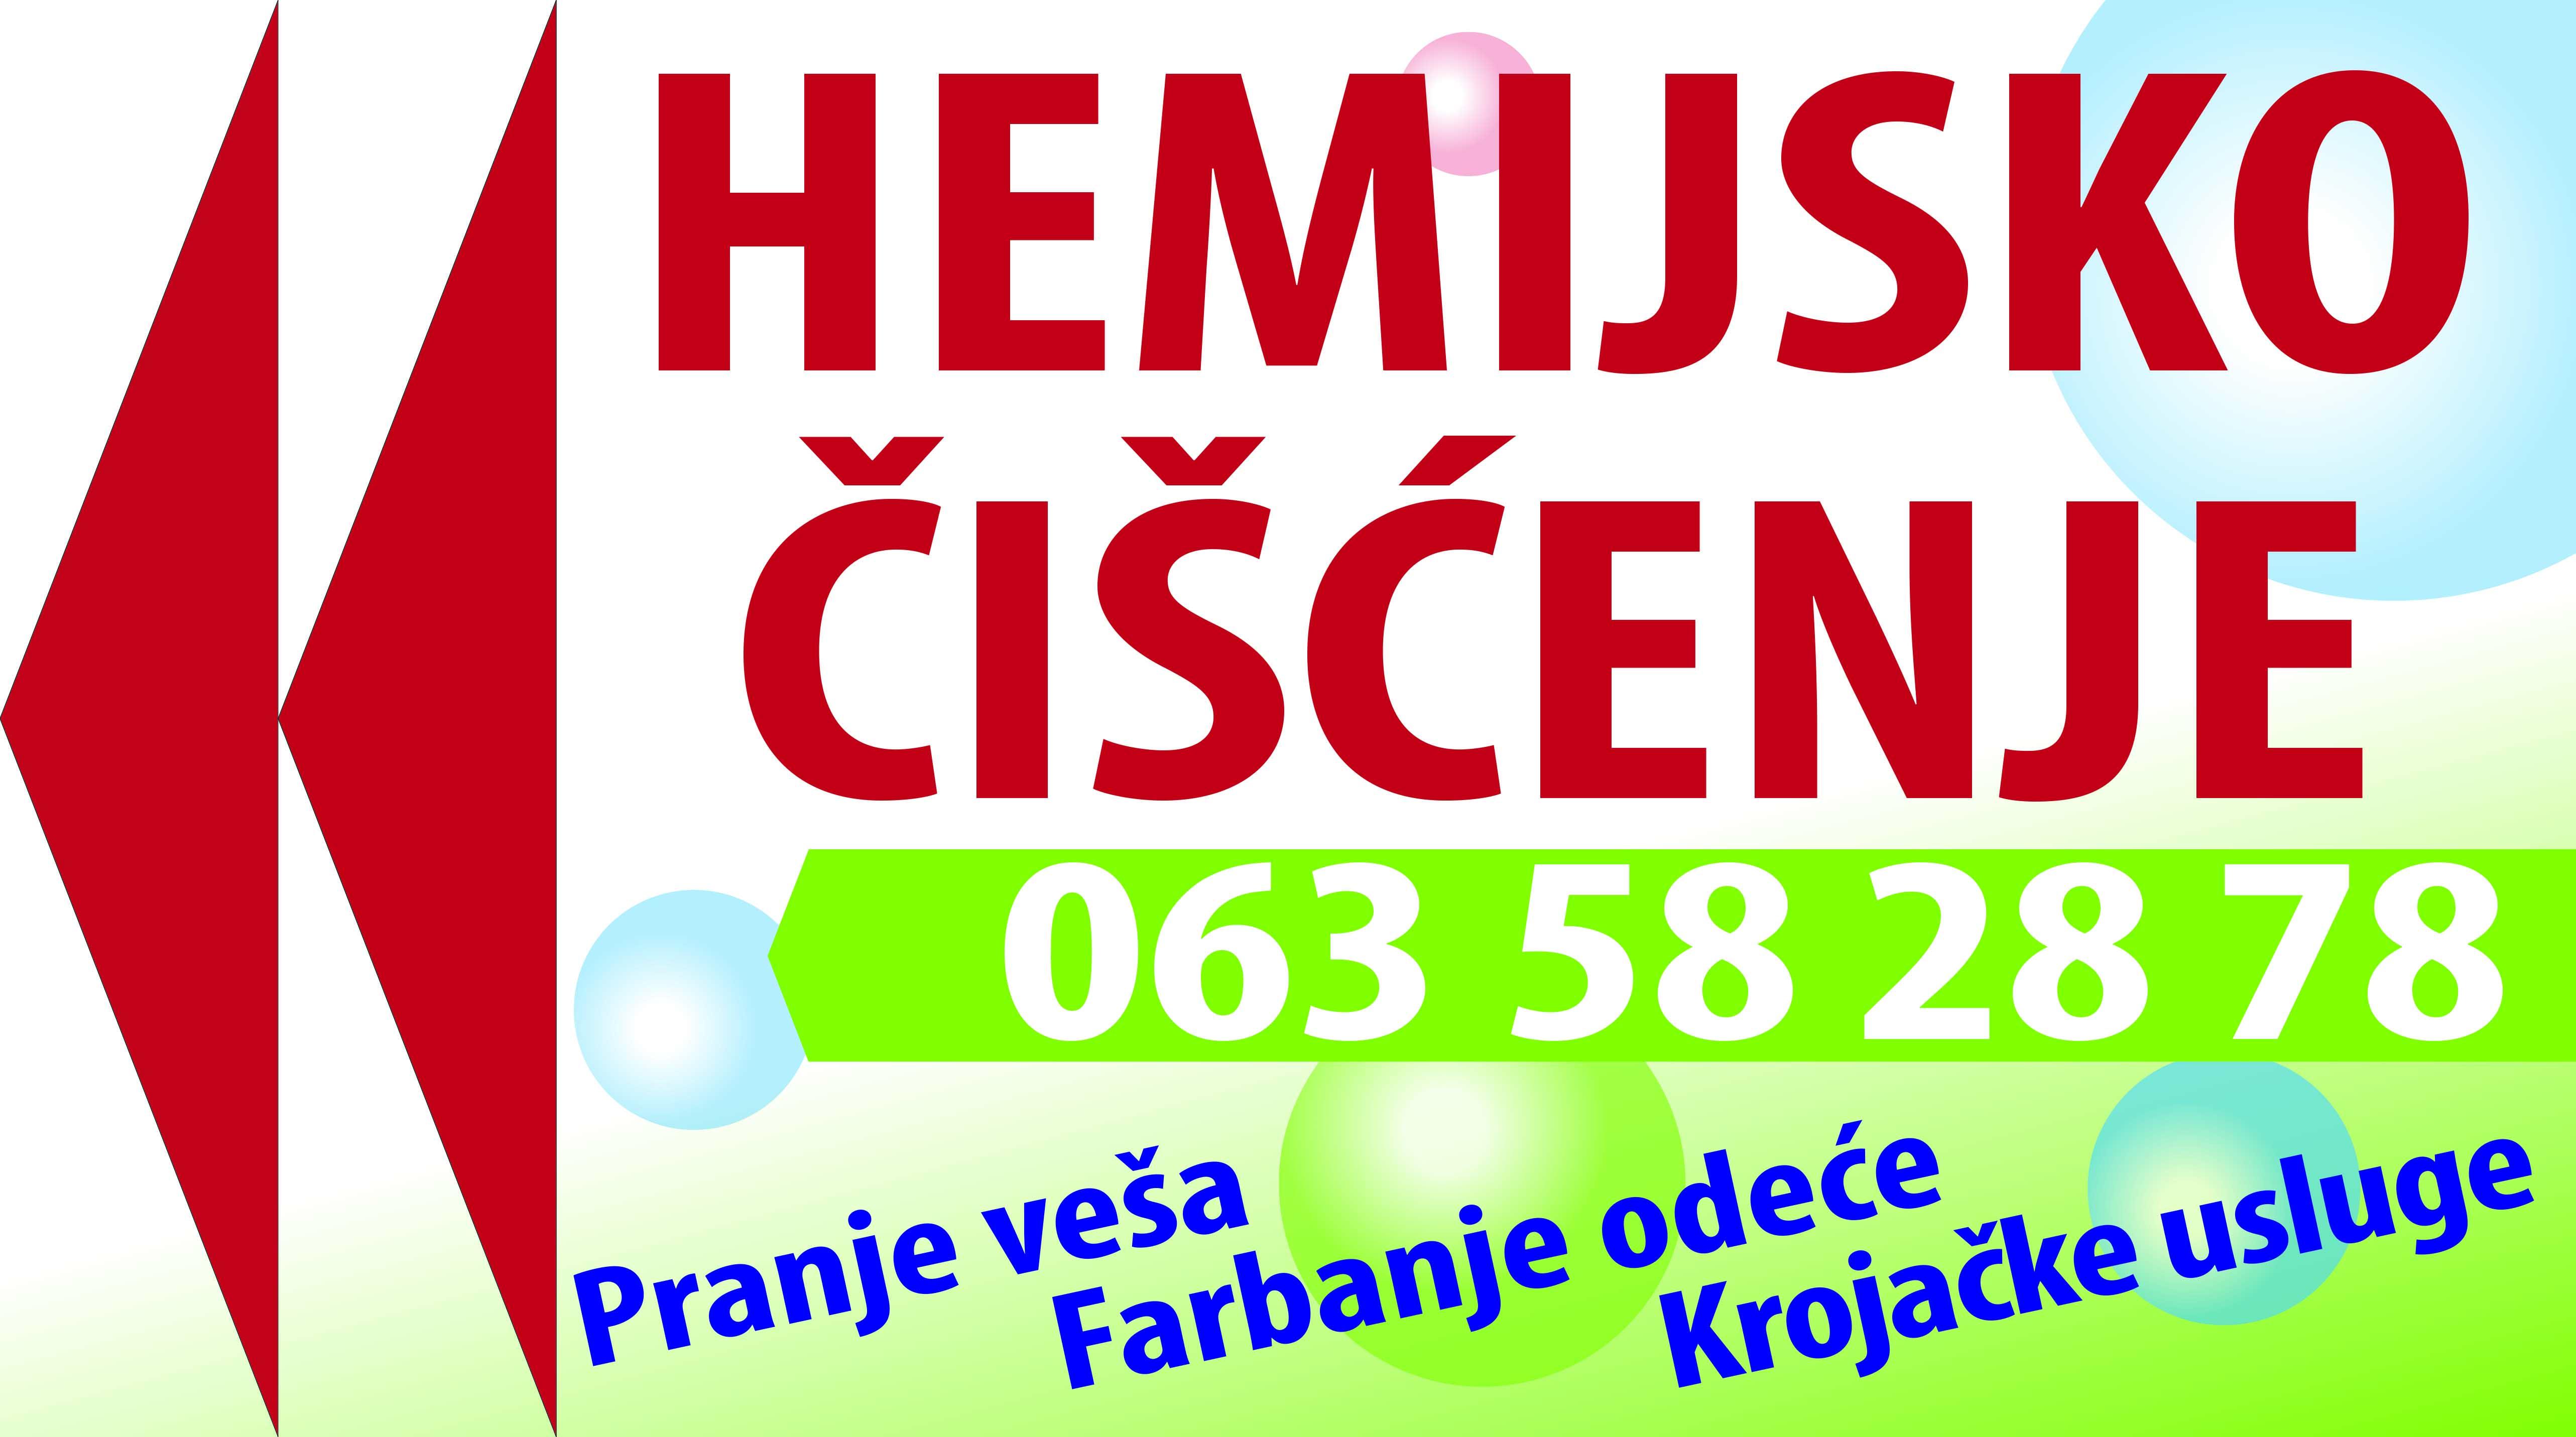 HEMIJSKO